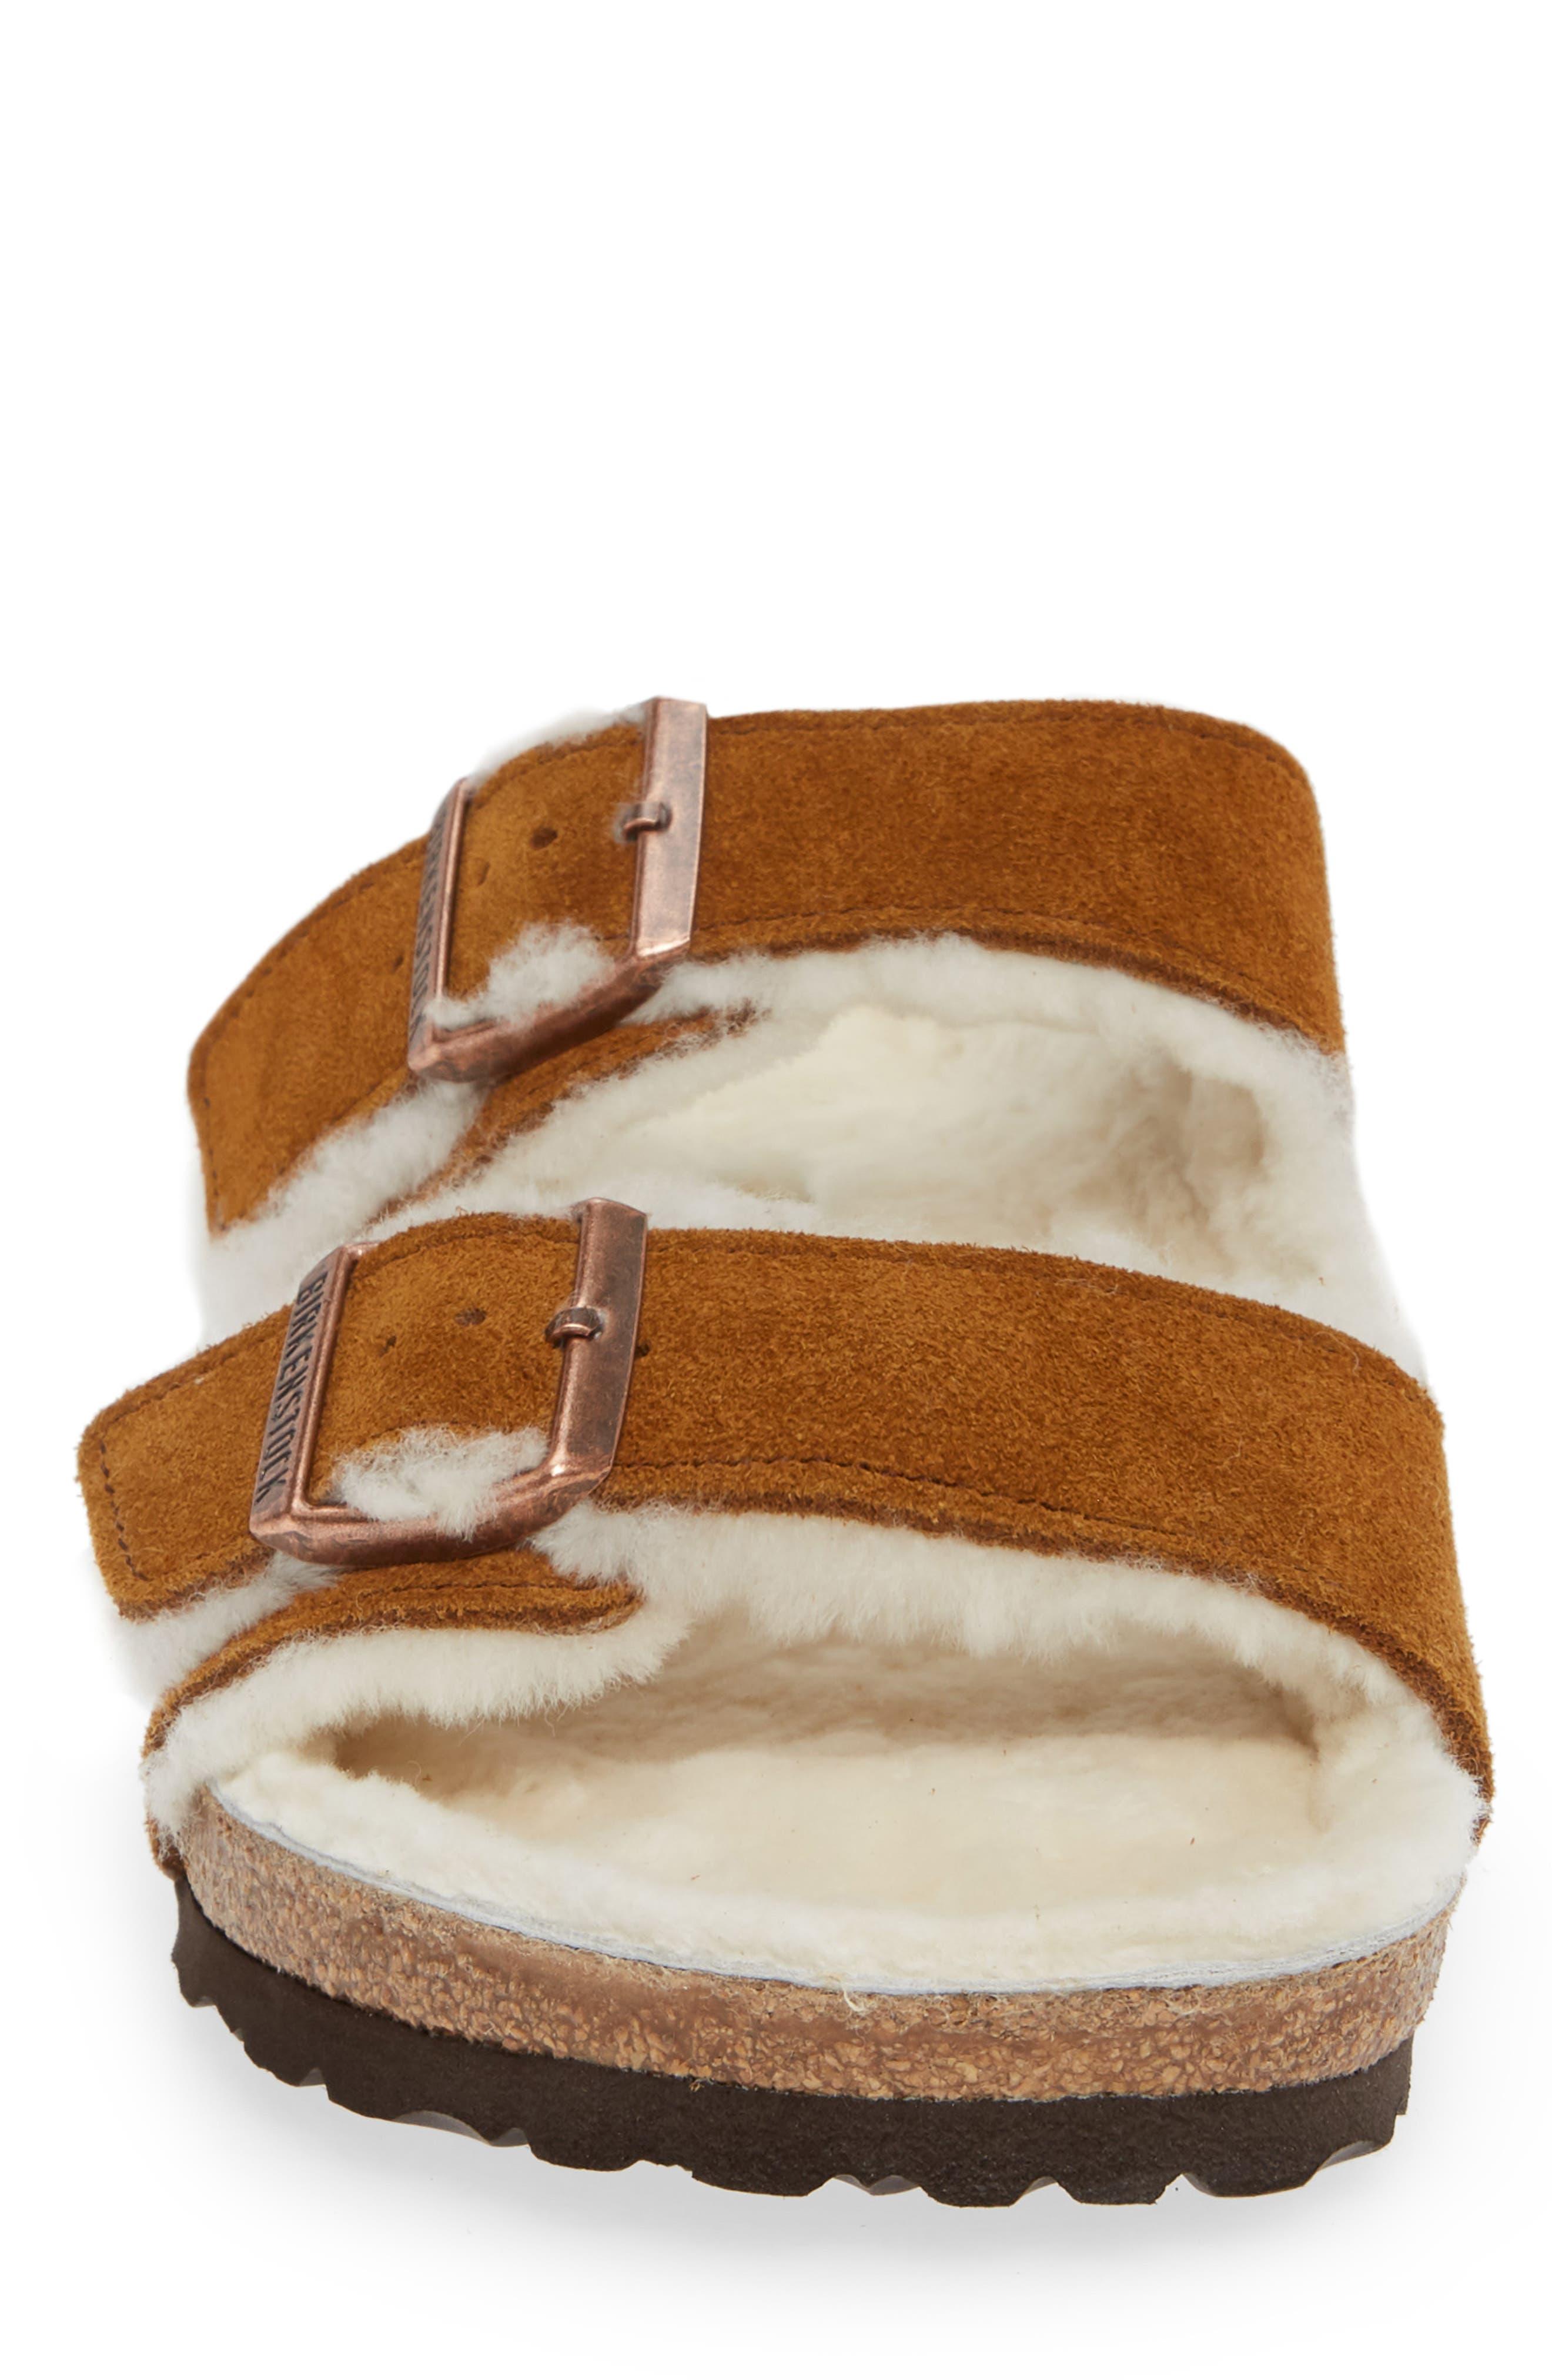 Arizona Slide Sandal with Genuine Shearling,                             Alternate thumbnail 4, color,                             BEIGE